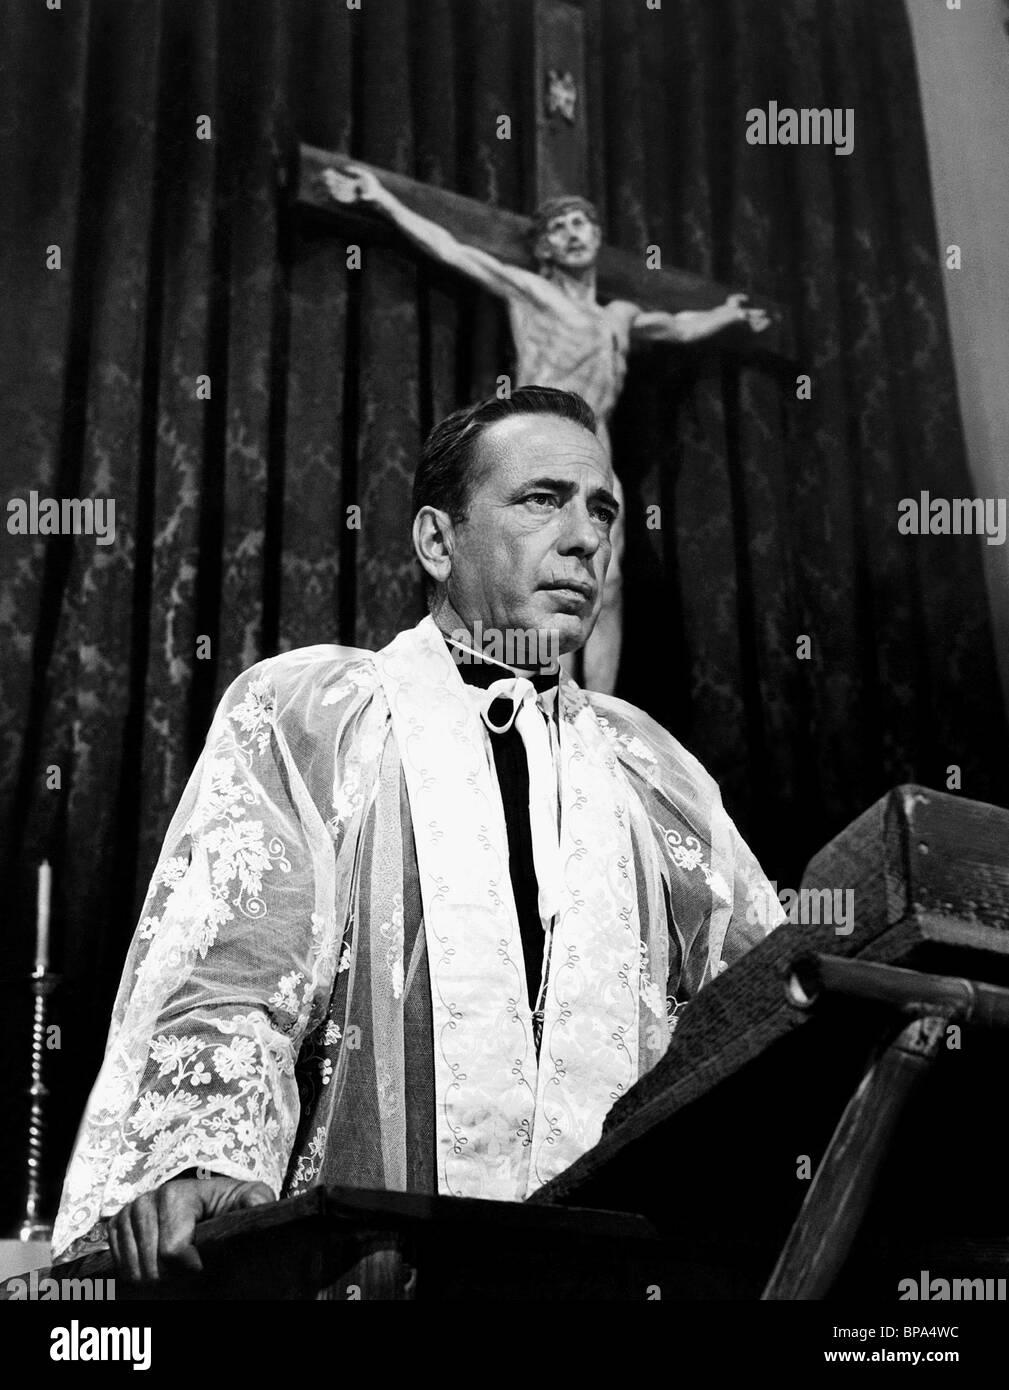 HUMPHREY BOGART THE LEFT HAND OF GOD (1955) - Stock Image